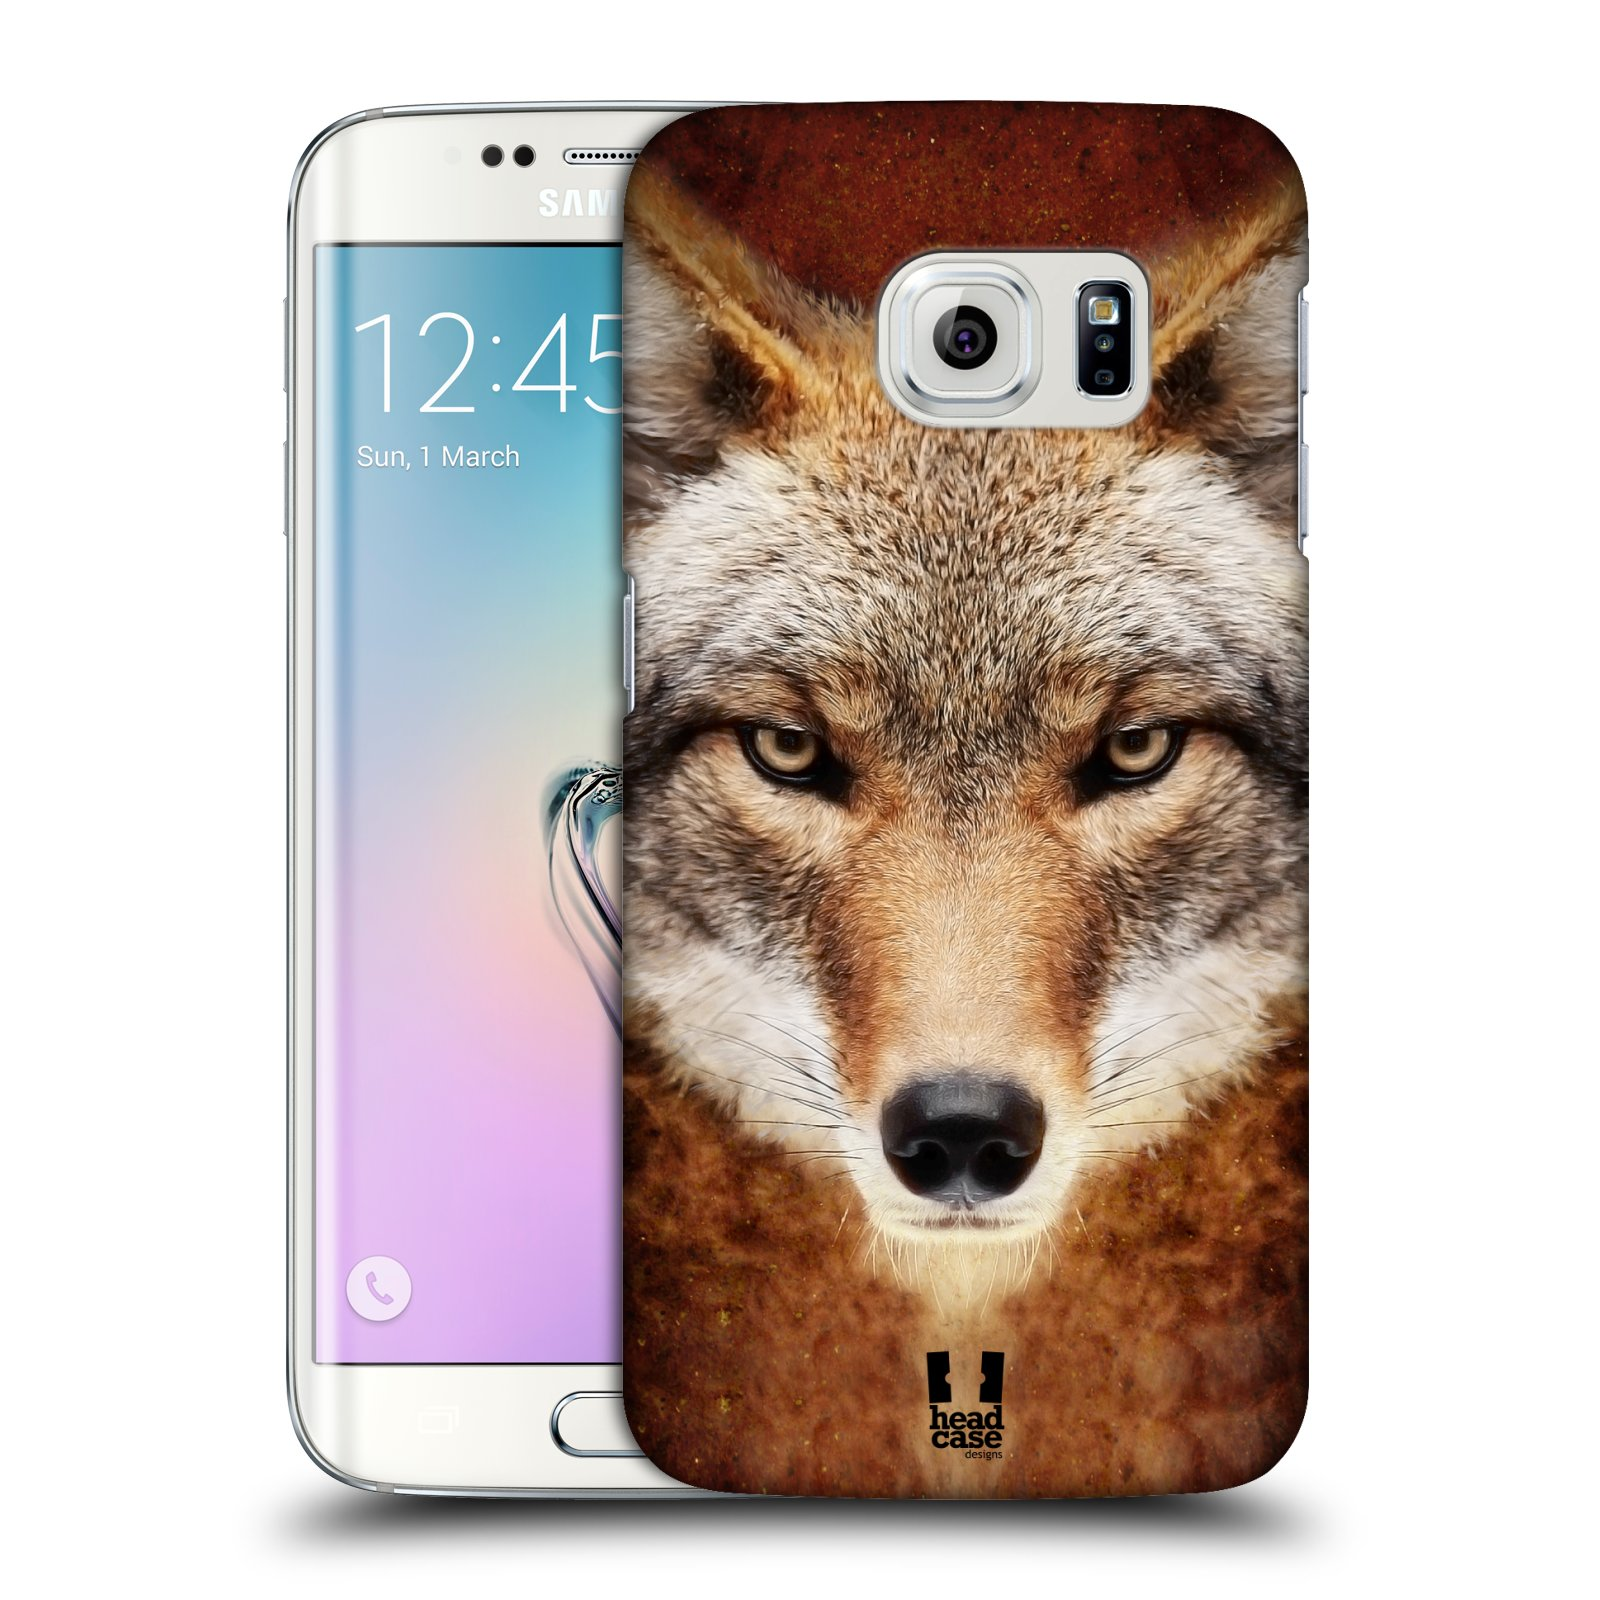 HEAD CASE plastový obal na mobil SAMSUNG Galaxy S6 EDGE (G9250, G925, G925F) vzor Zvířecí tváře kojot